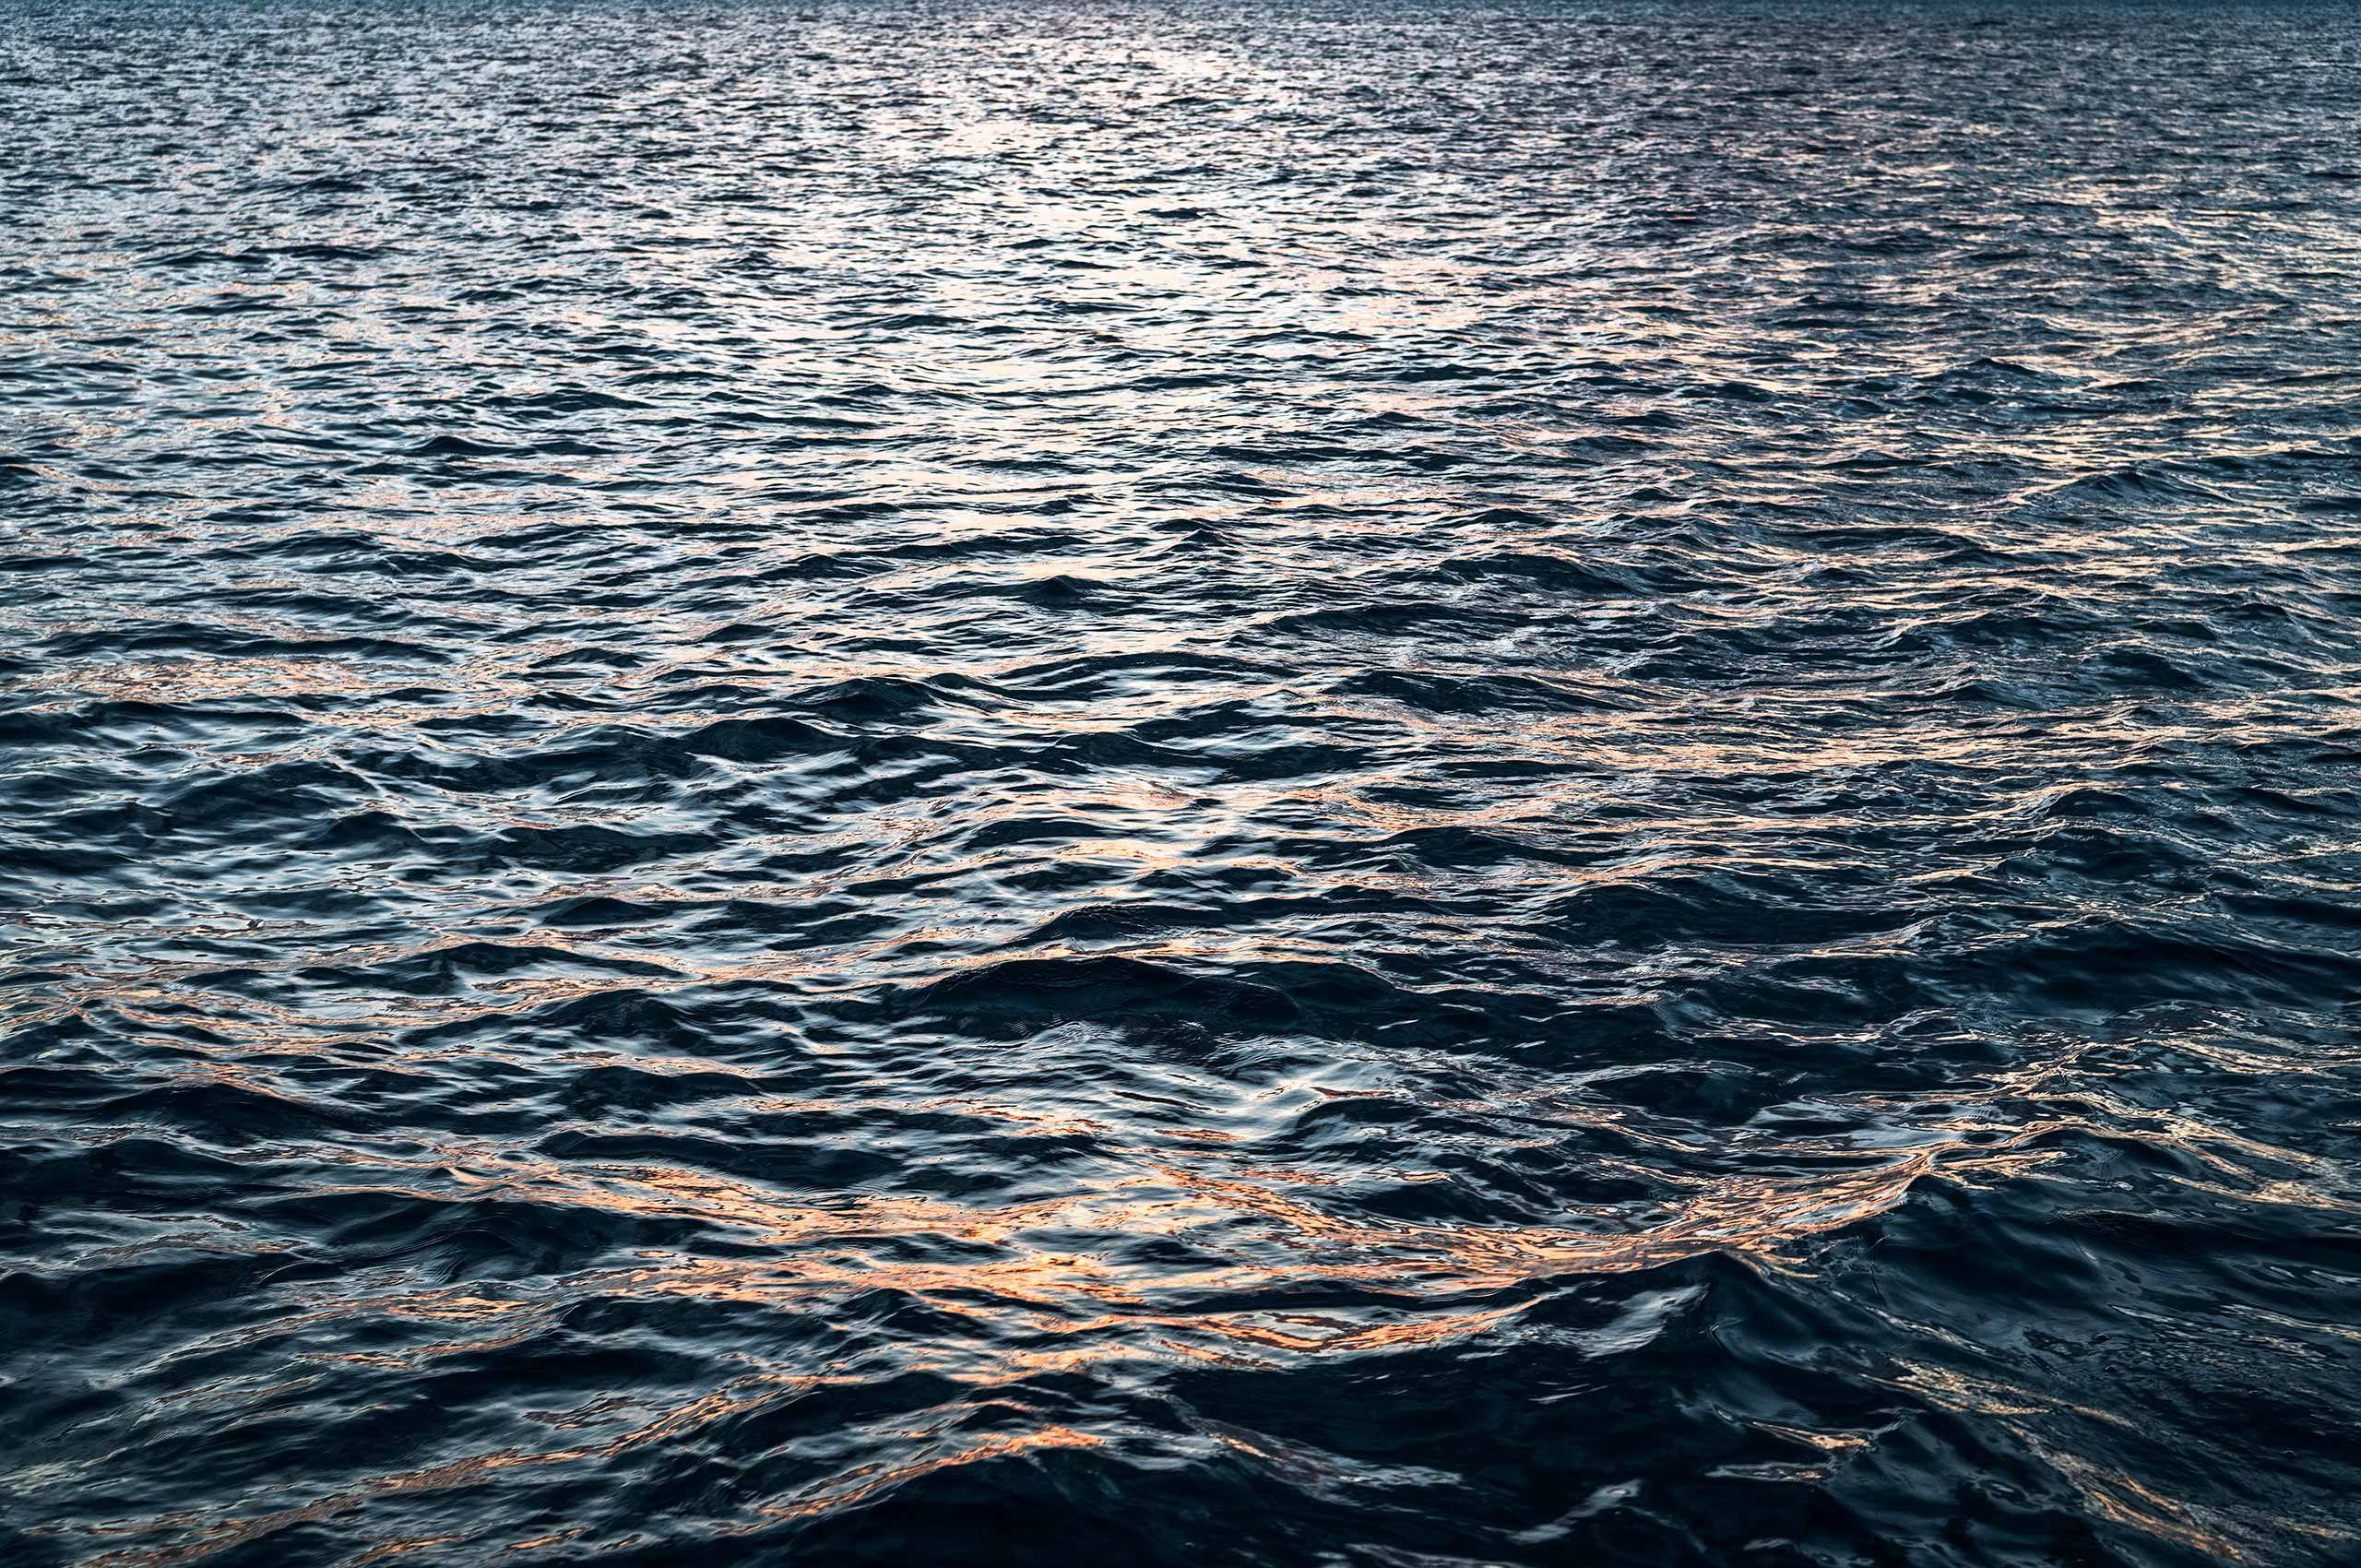 Waves-Ocean-HenrikOlundPhotography.jpg